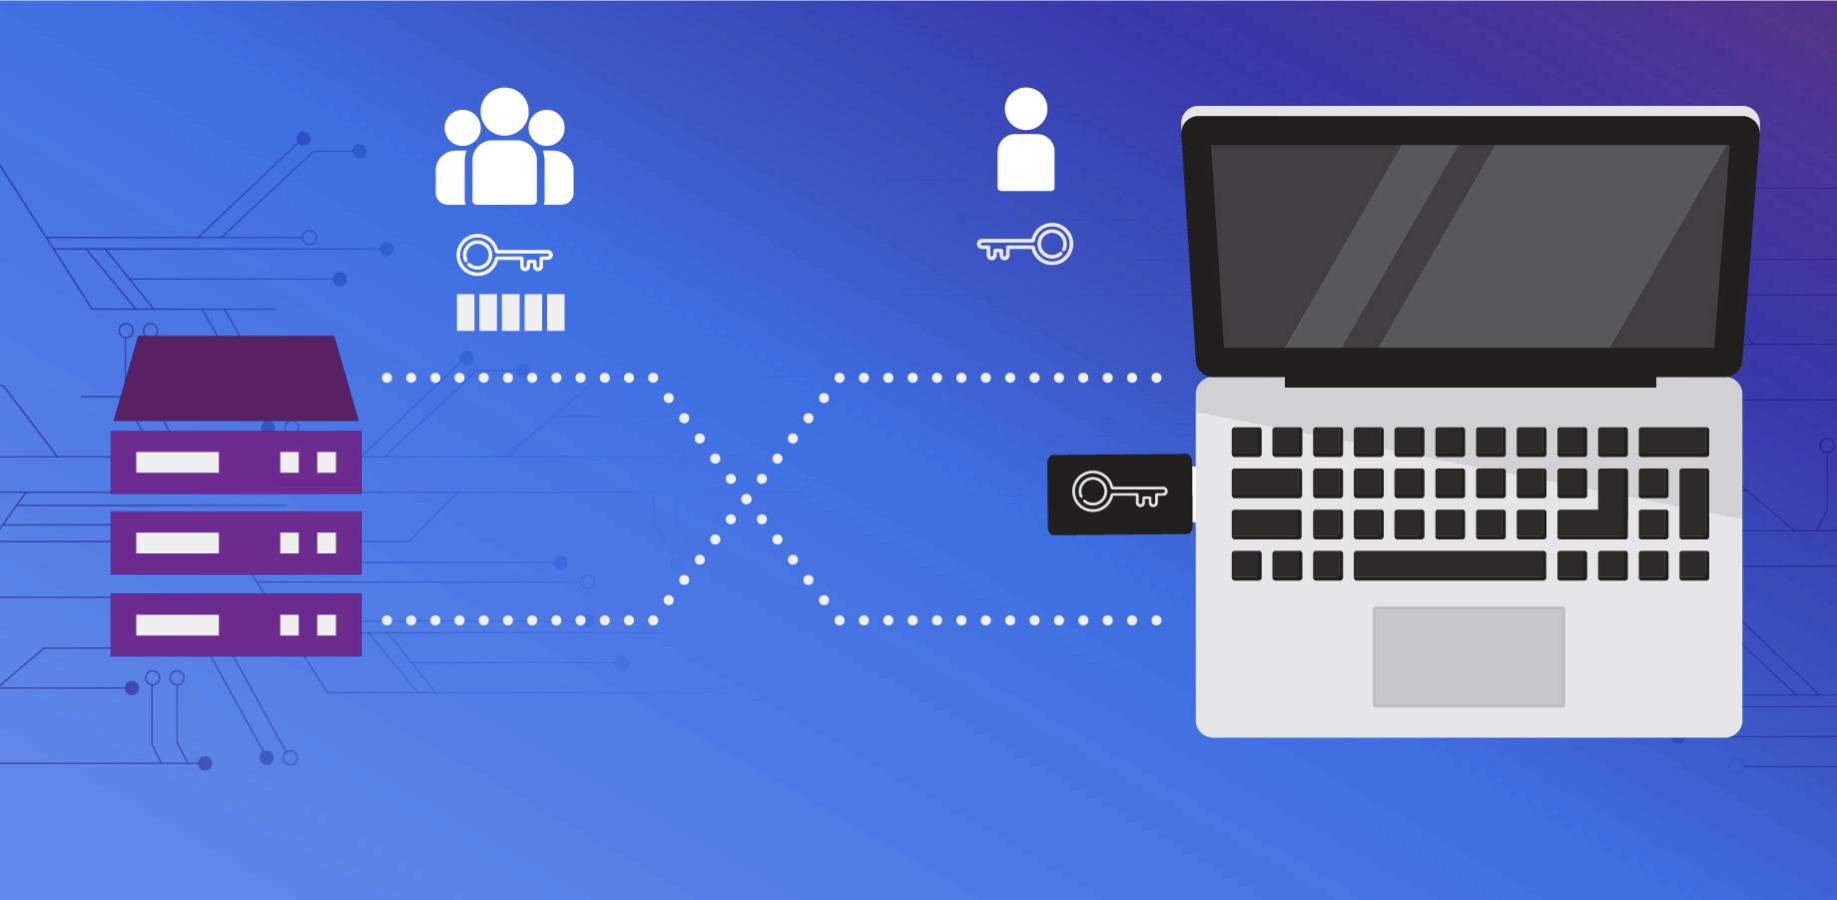 passless - Microsoft: 2021 το τέλος των κωδικών πρόσβασης